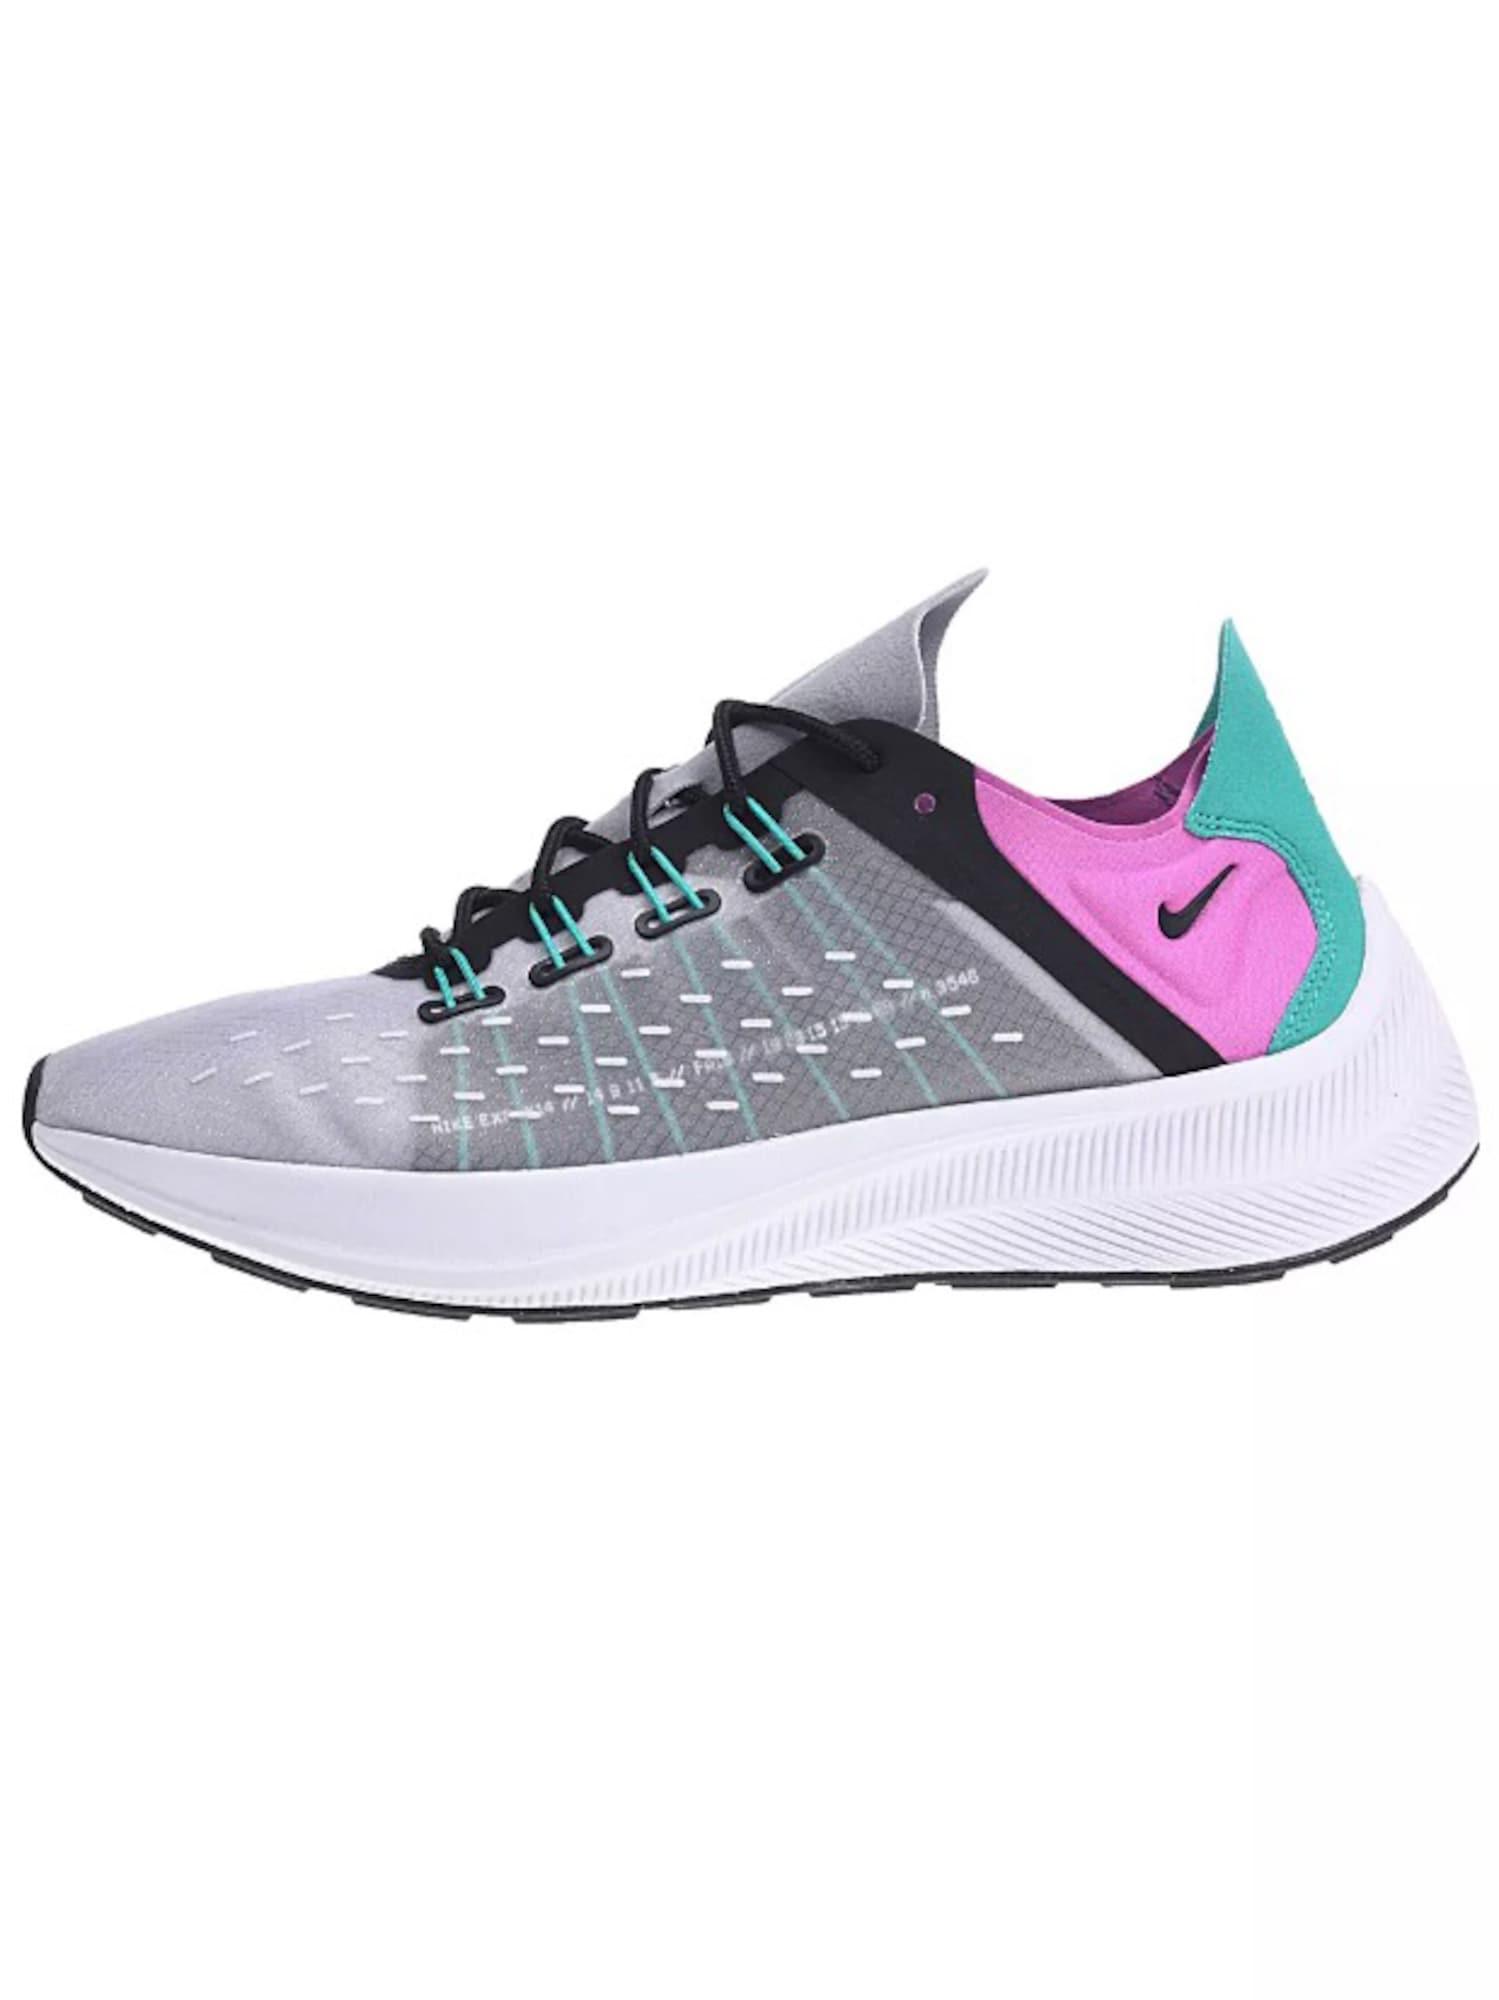 Nike Sportswear, Dames Sneakers laag 'Exp-X14', turquoise / grijs / pink